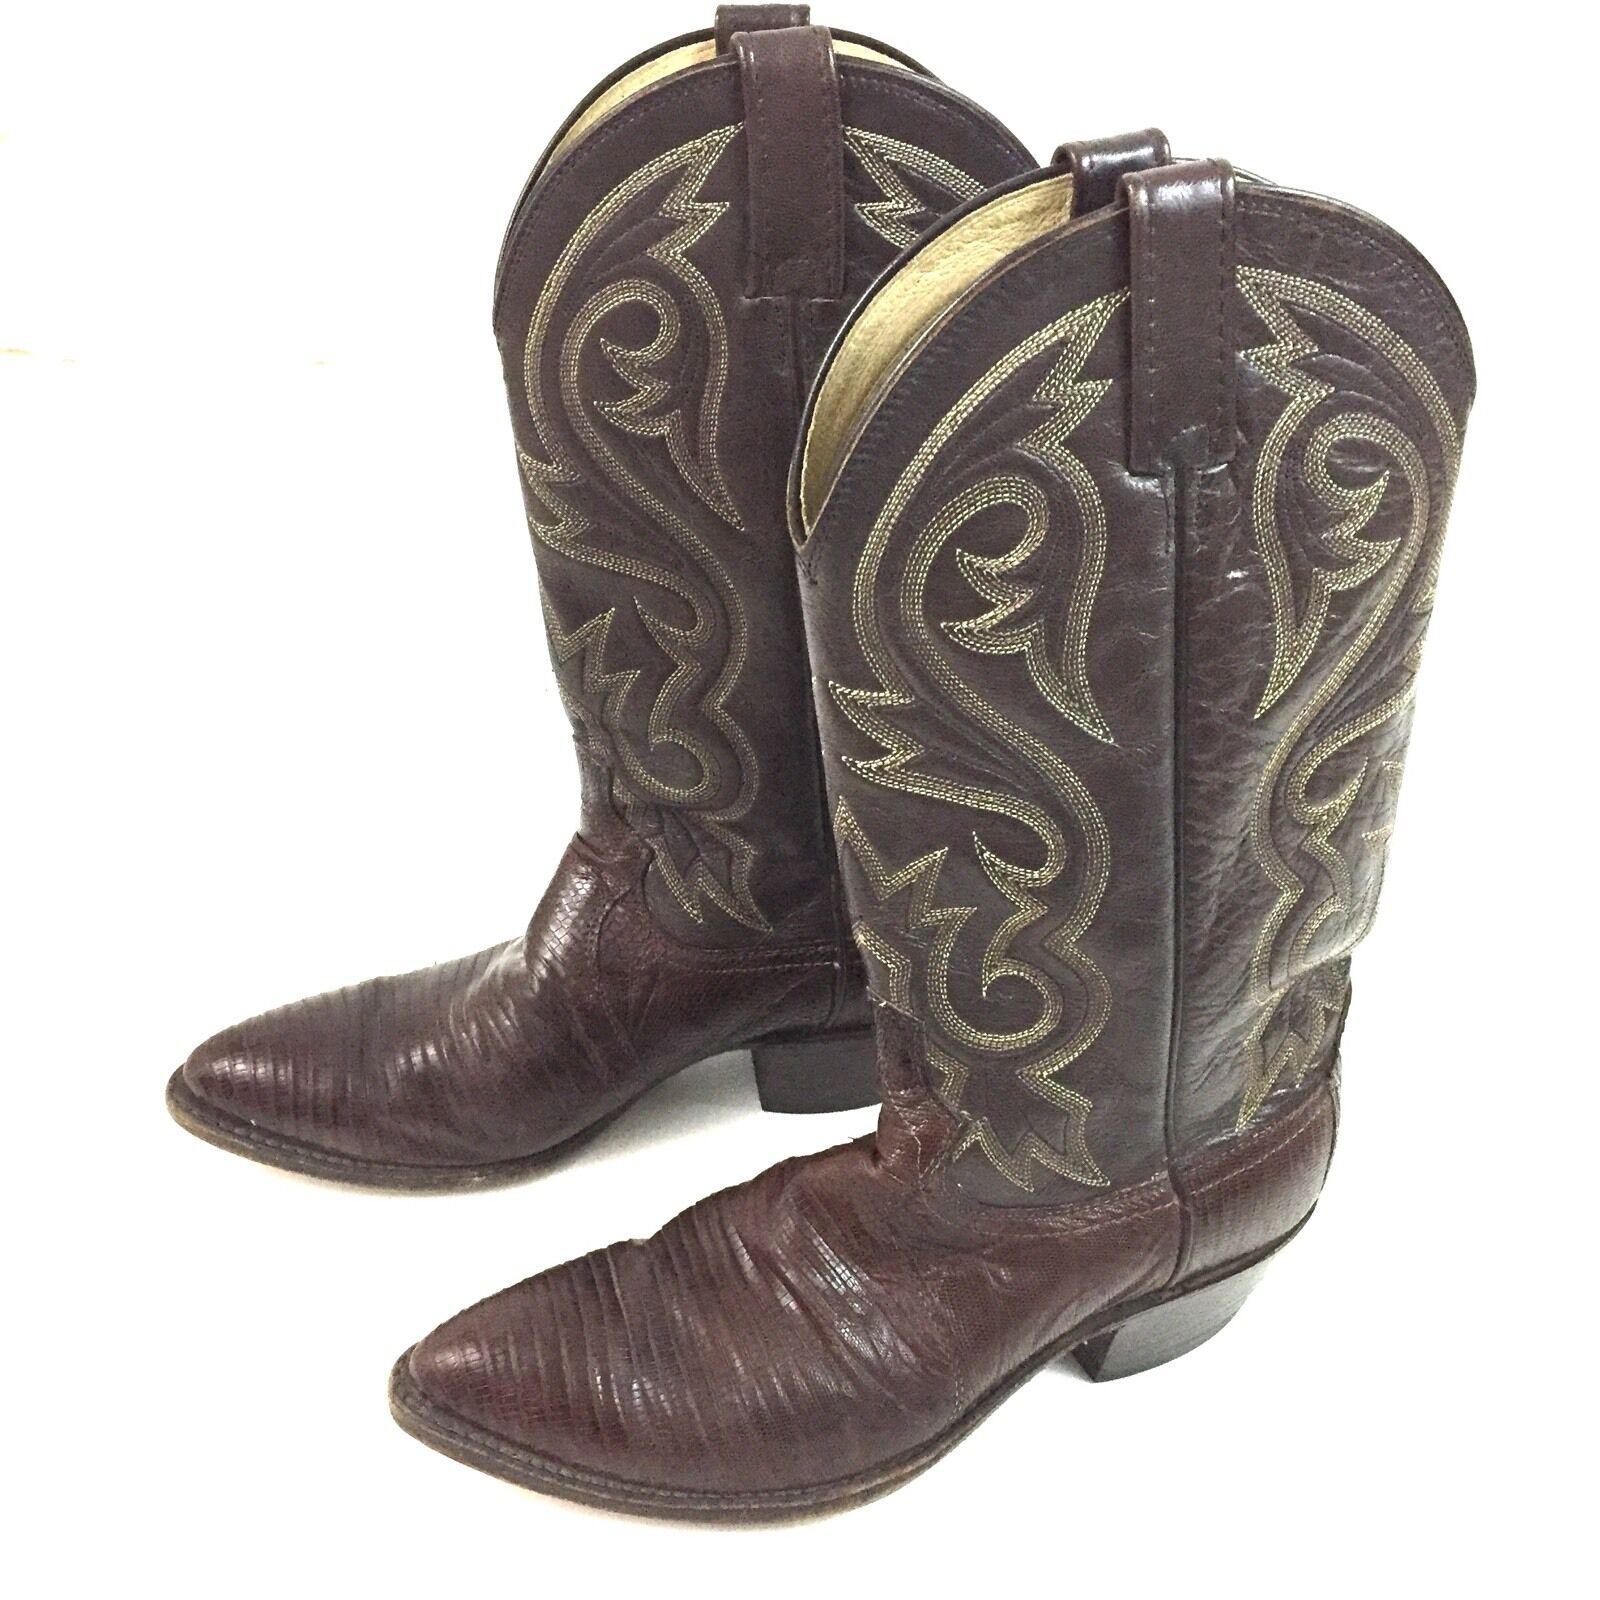 Vtg Dan Post Lizard Skin Pelle Cowboy Stivali 9D